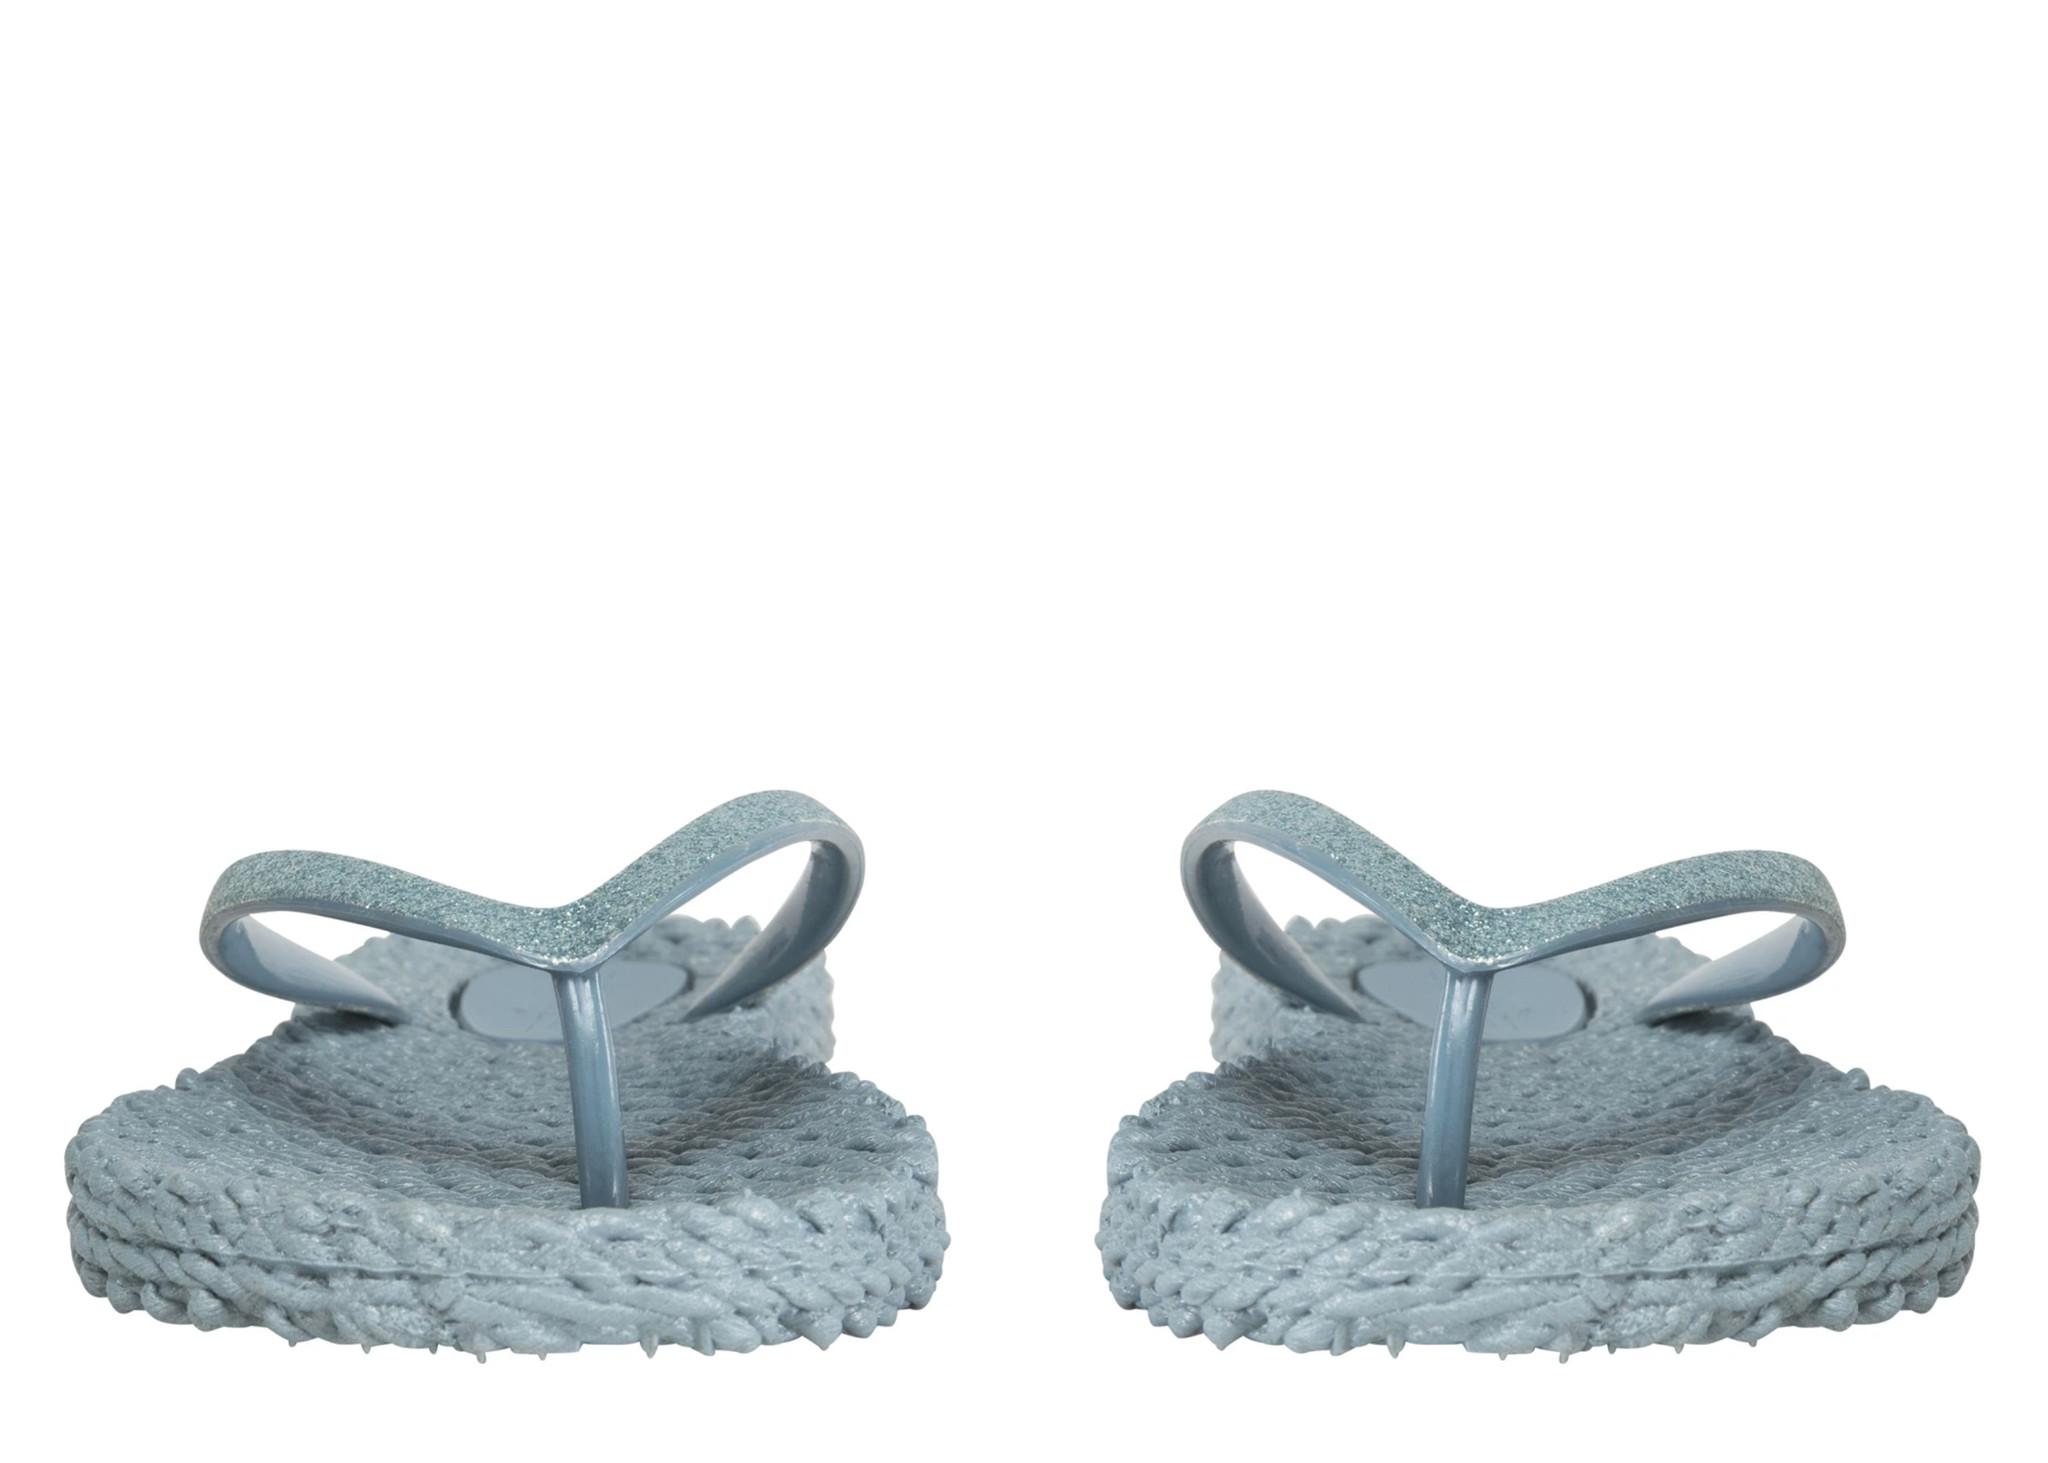 ILSE JACOBSEN  Ilse Jacobsen Slipper Cheerful01 Lichen Blue